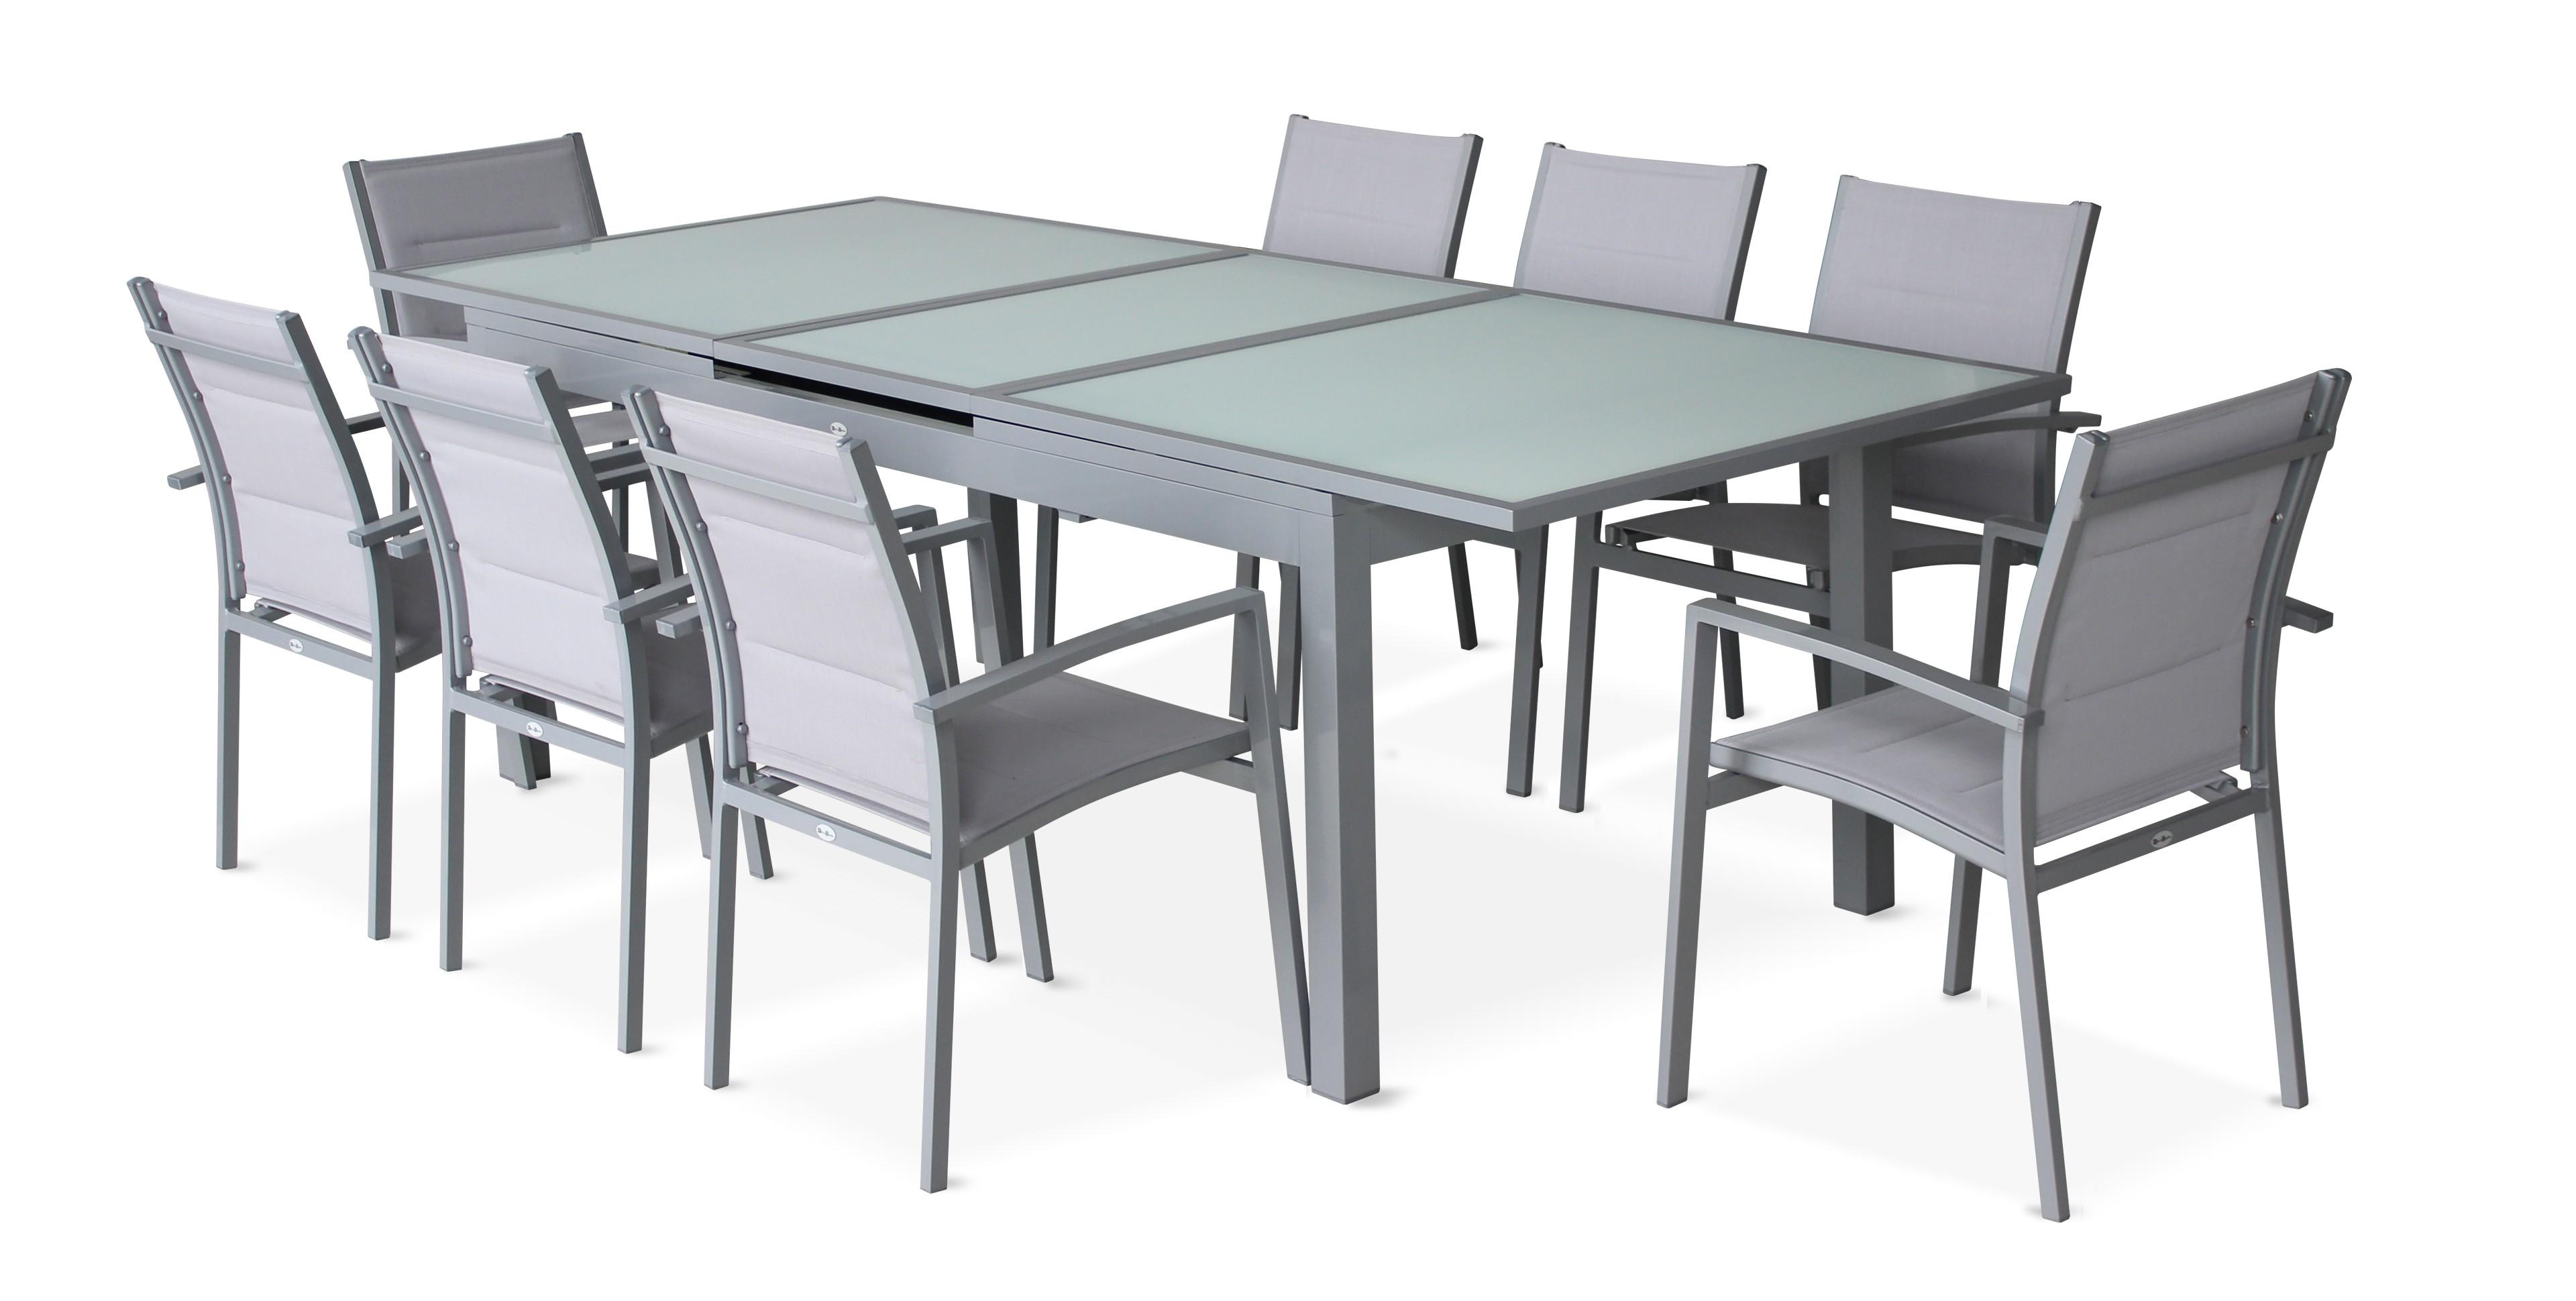 table de jardin naterial niagara rectangulaire gris 10 personnes